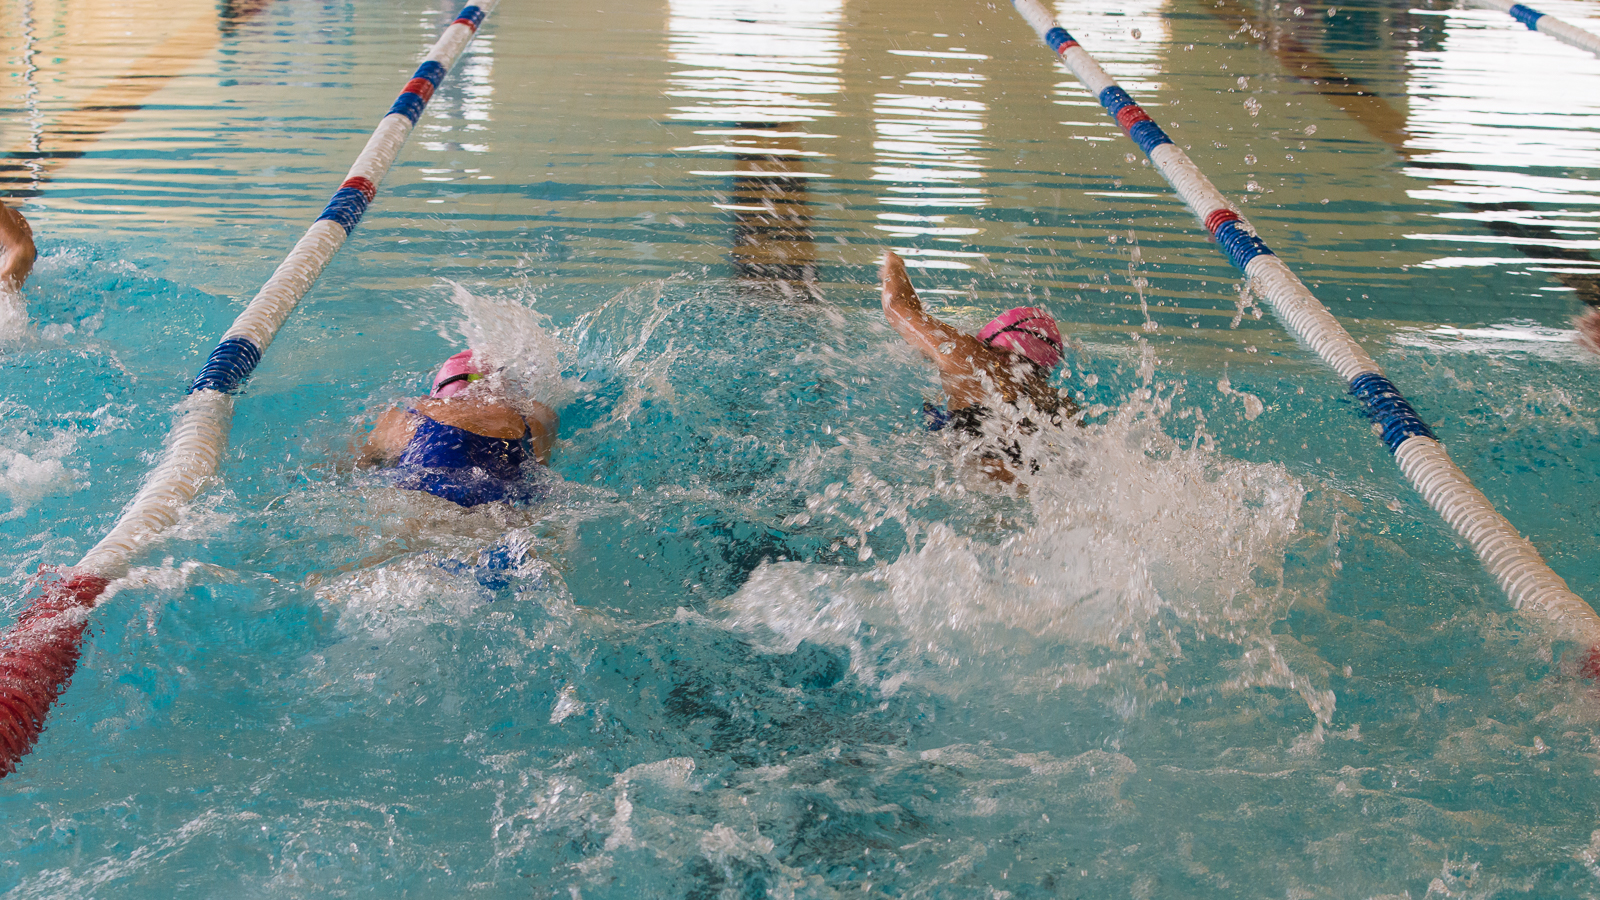 Les palmes fr jus natation for Palmes natation piscine